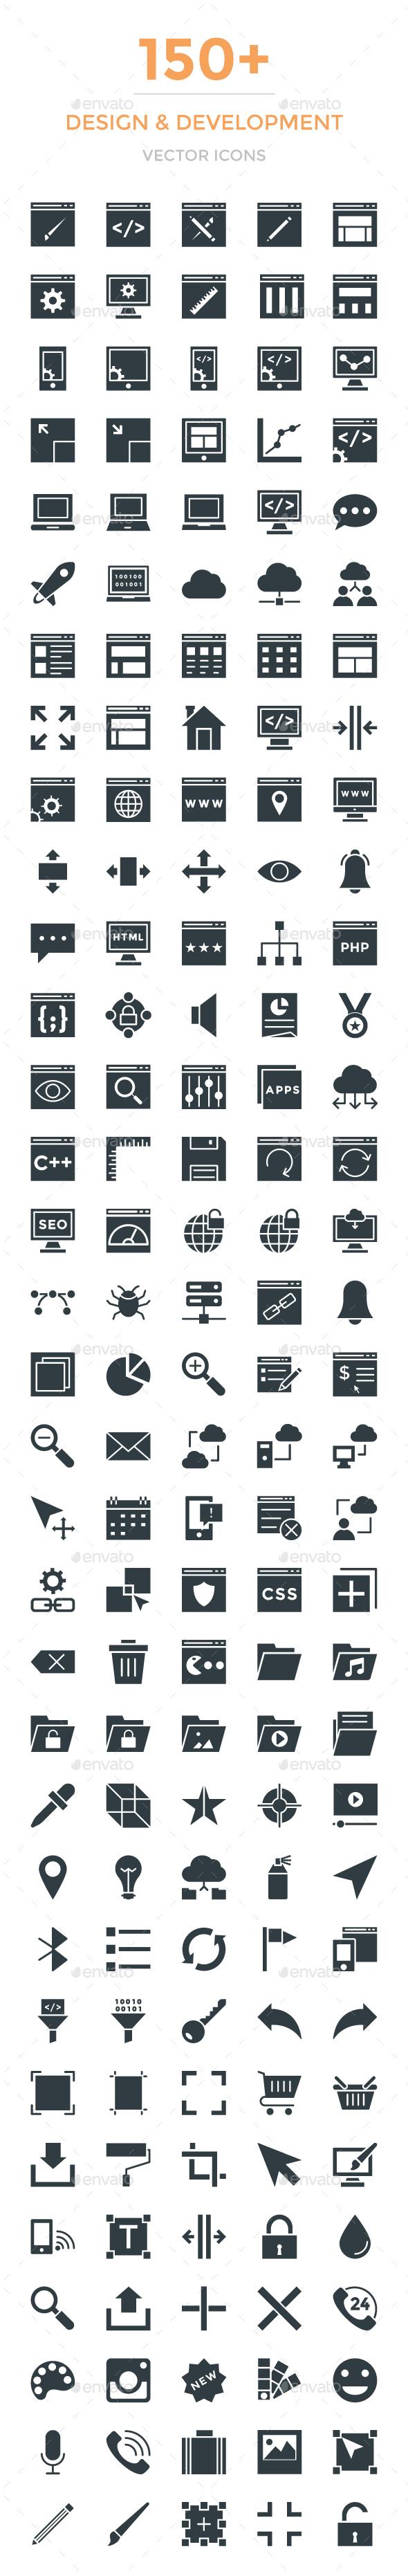 150+ Design and Development Icons